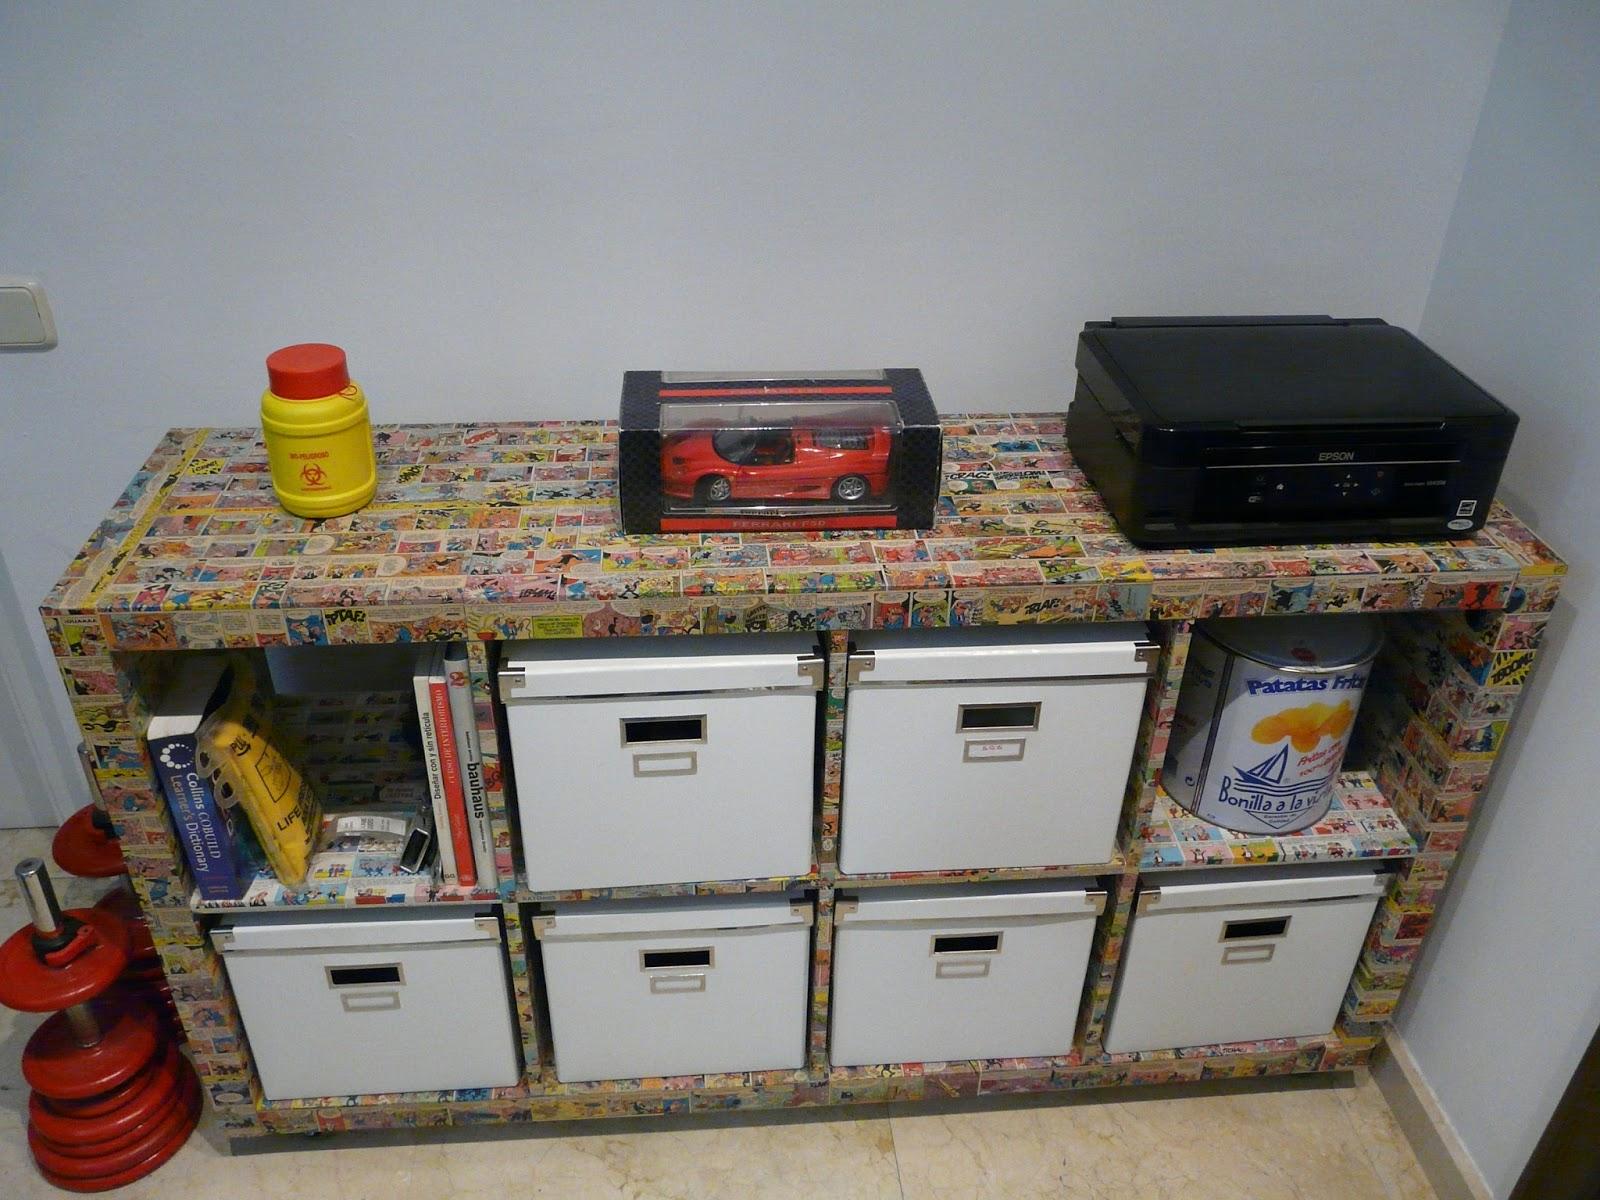 Upcycling design customiza ikea - Mueble expedit ikea ...